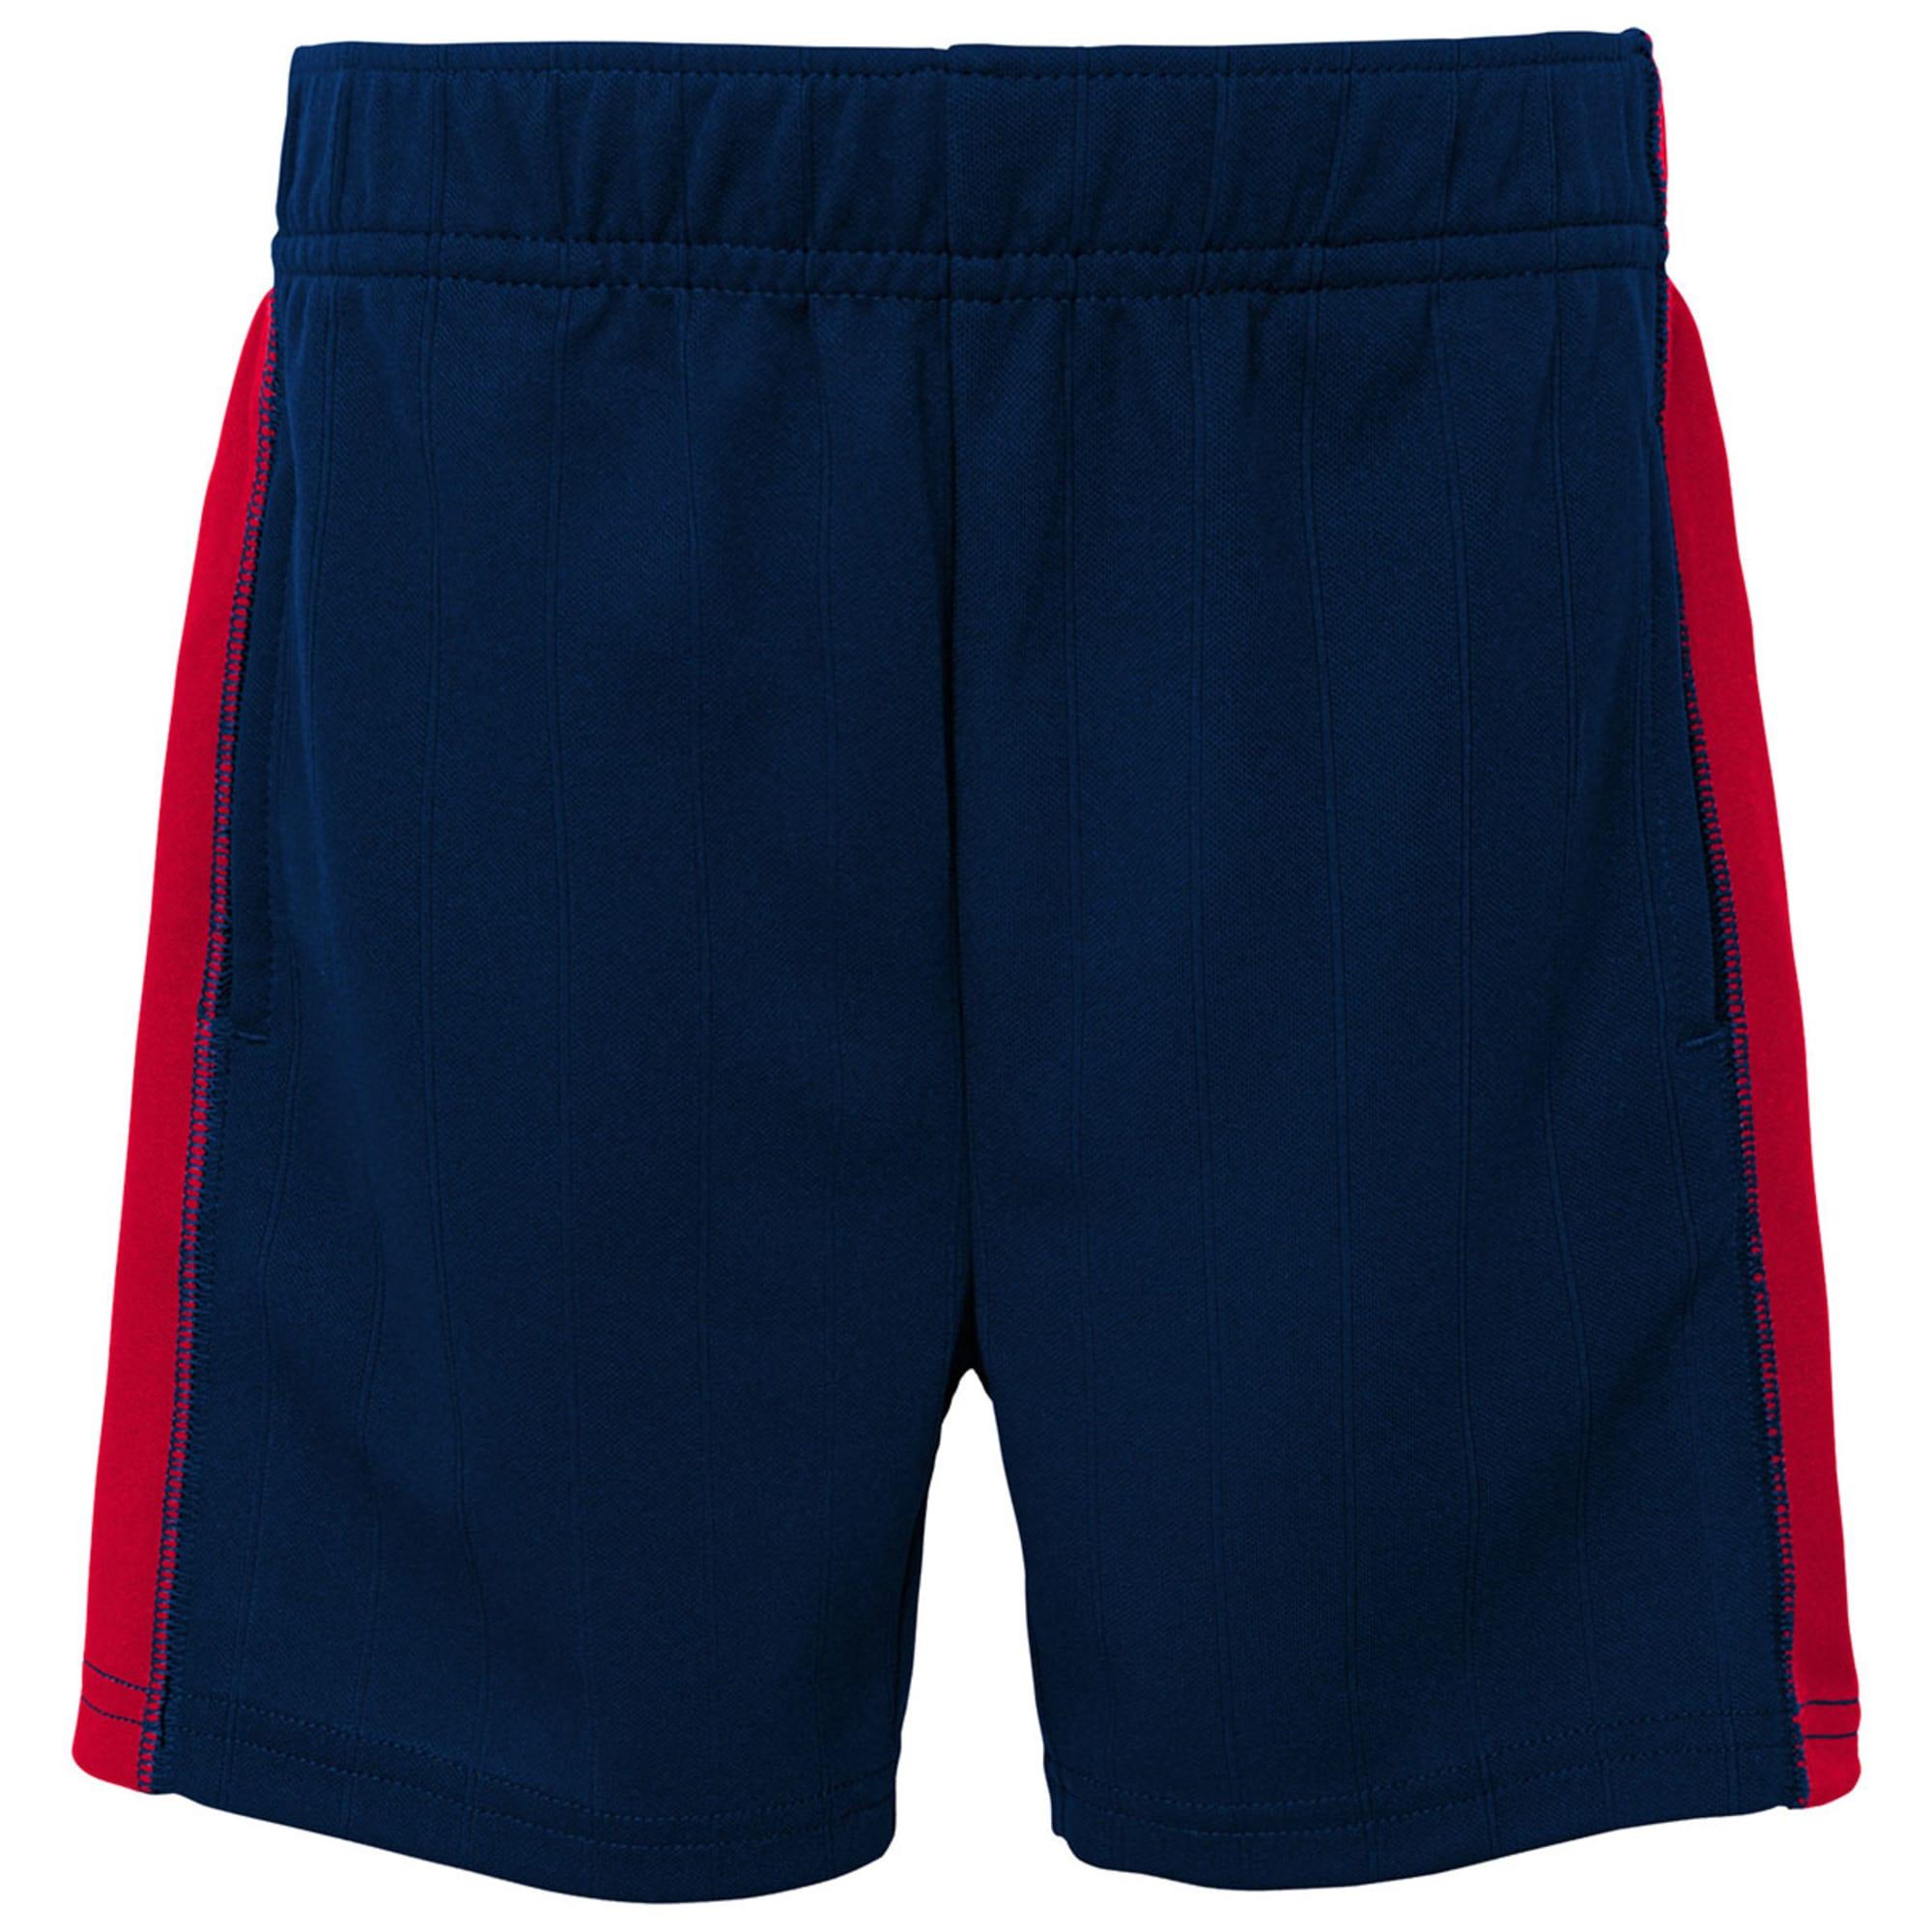 OuterStuff MLB Infants Toddler Play Strong Short Sleeve Henley Shirt /& Shorts Set